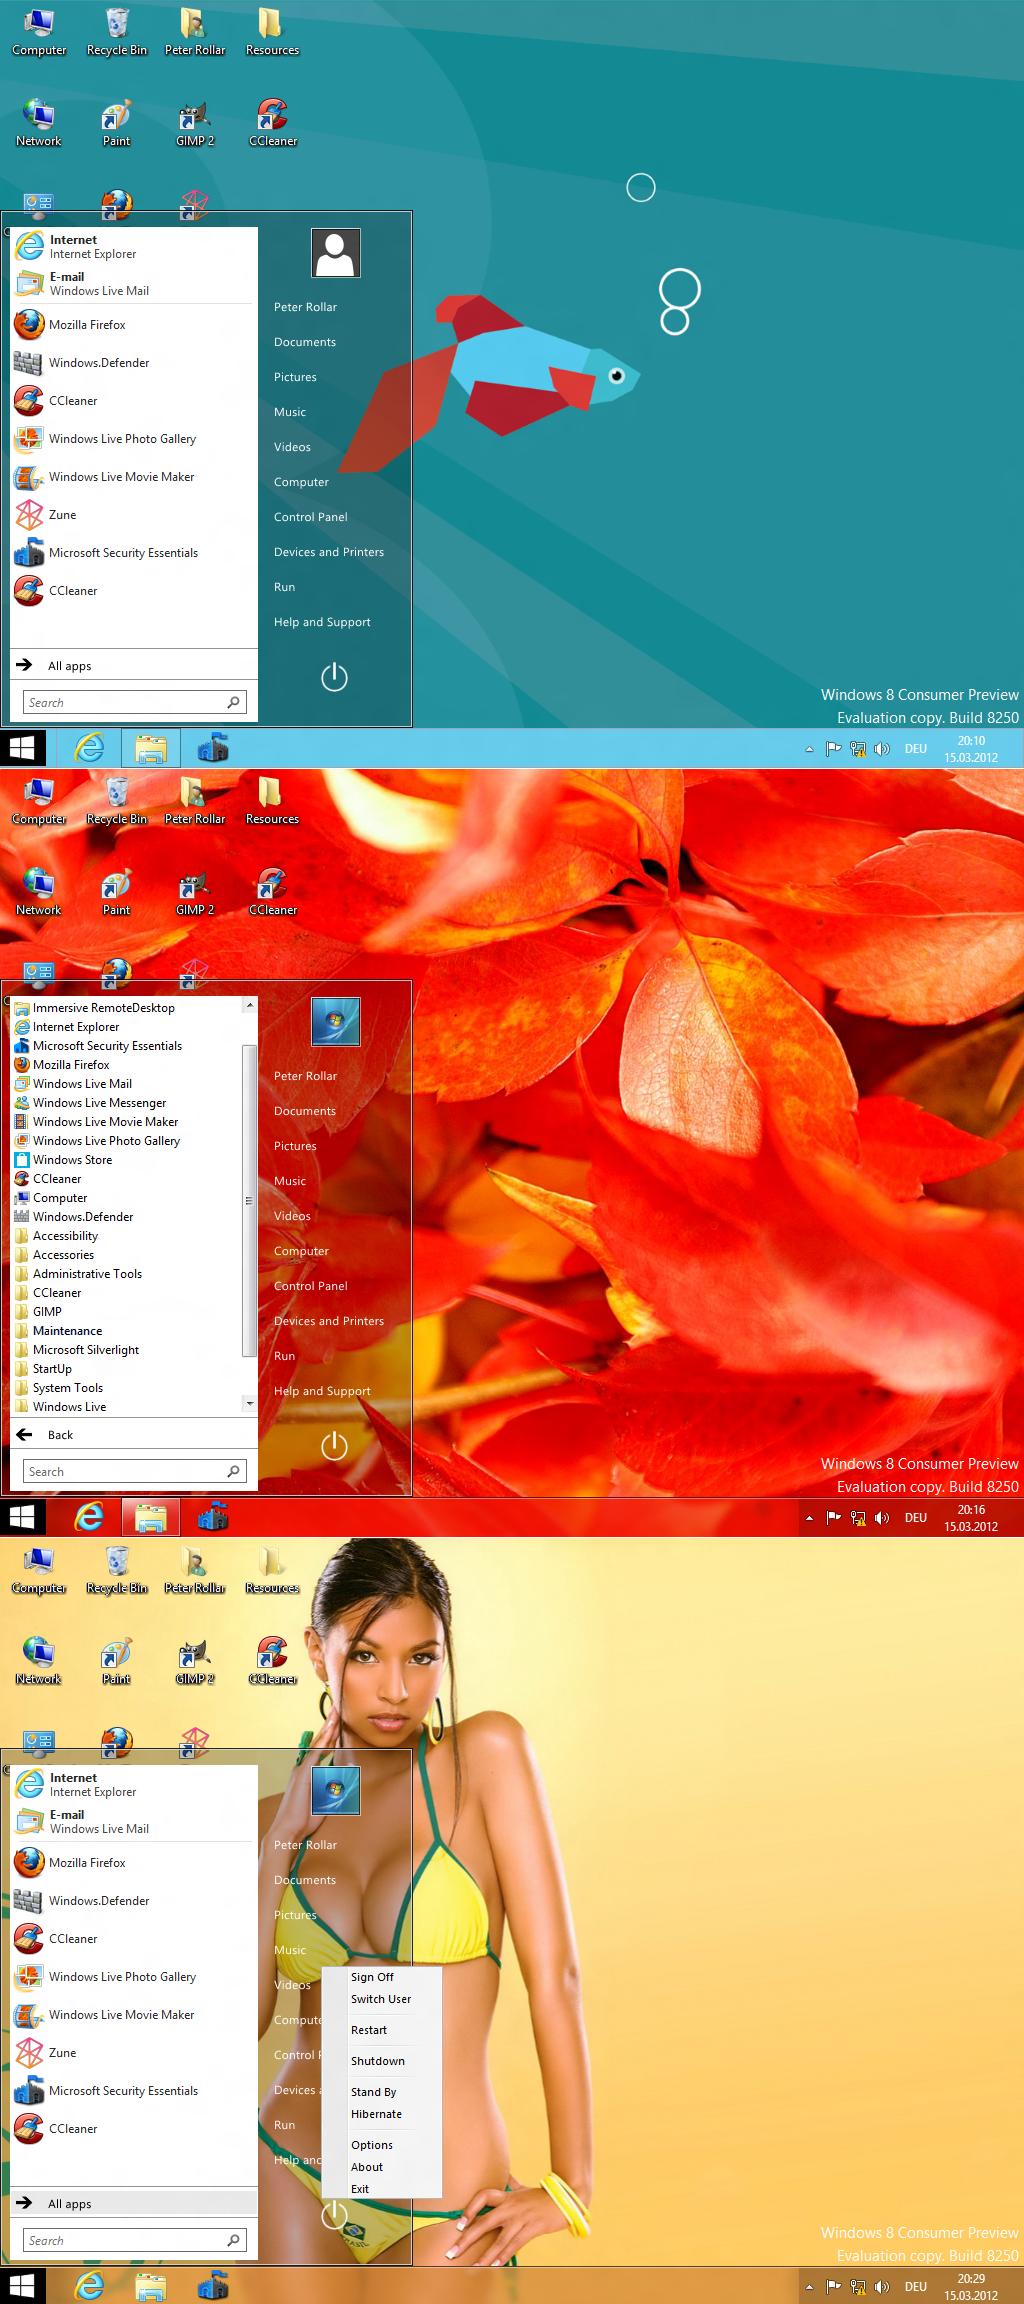 Startmenu for Windows8 Consumer Preview